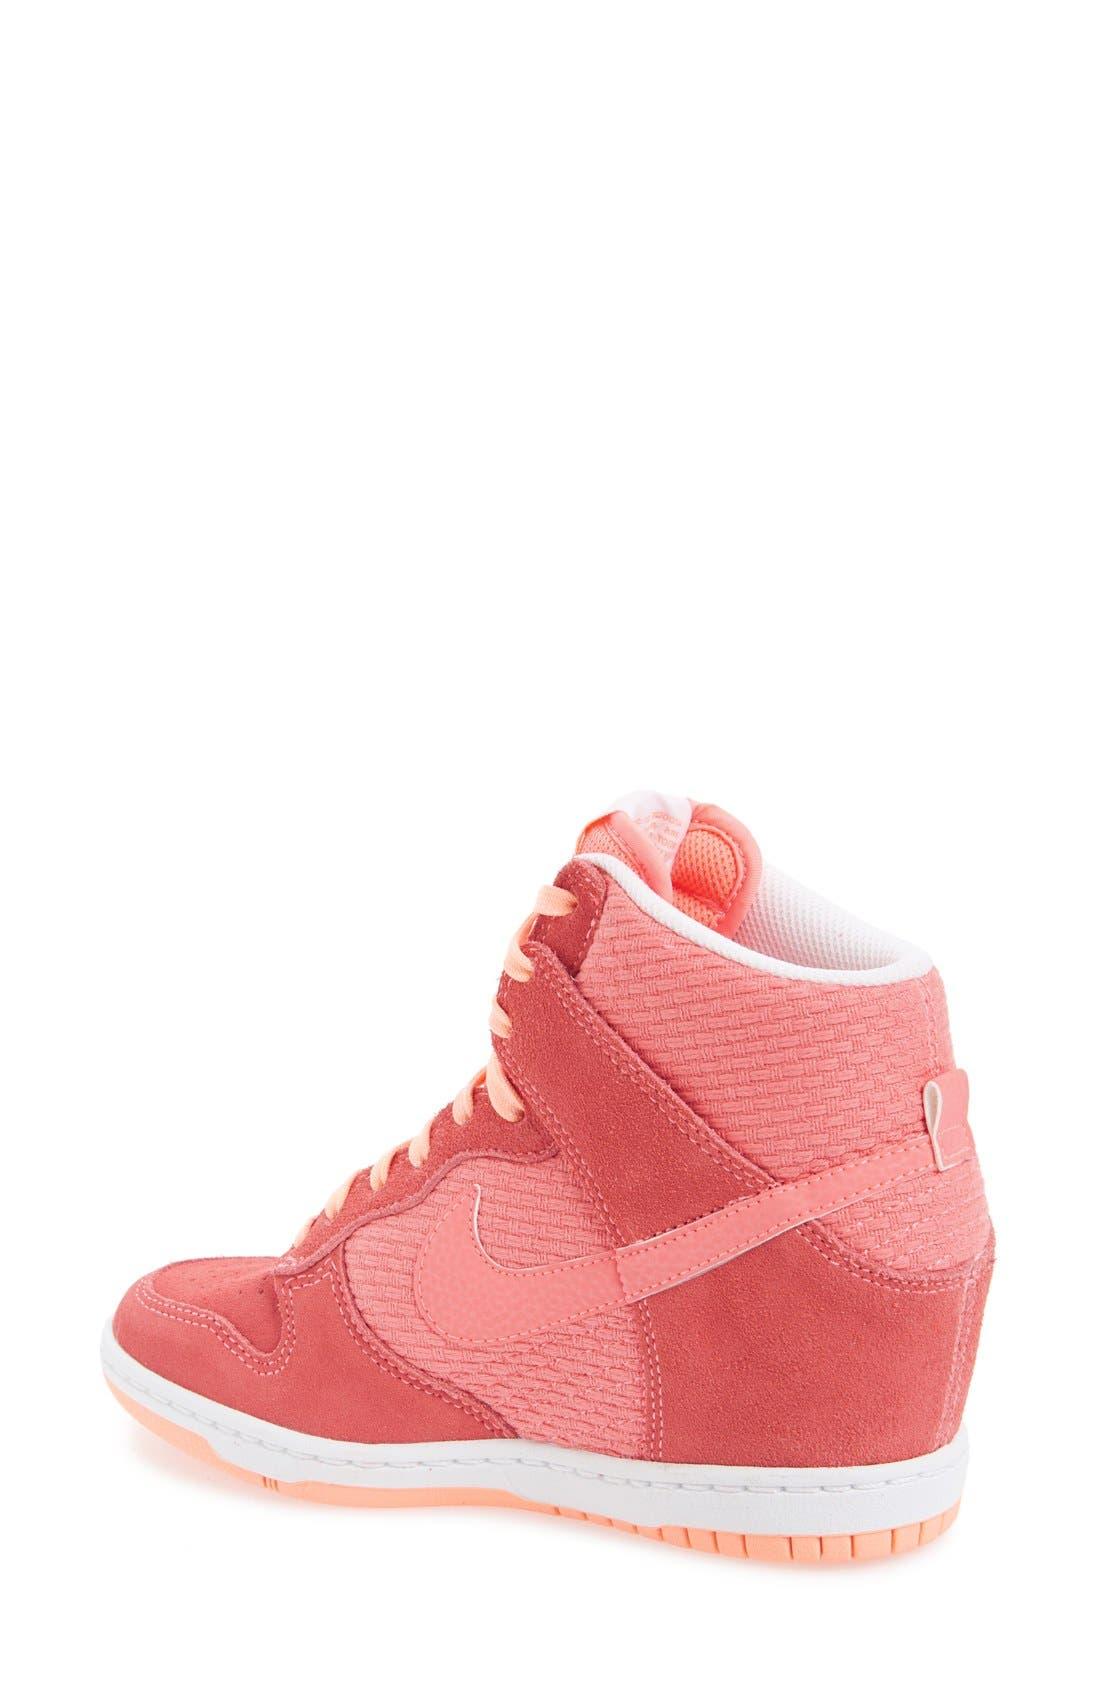 ,                             'Dunk Sky Hi - Essential' Wedge Sneaker,                             Alternate thumbnail 66, color,                             950